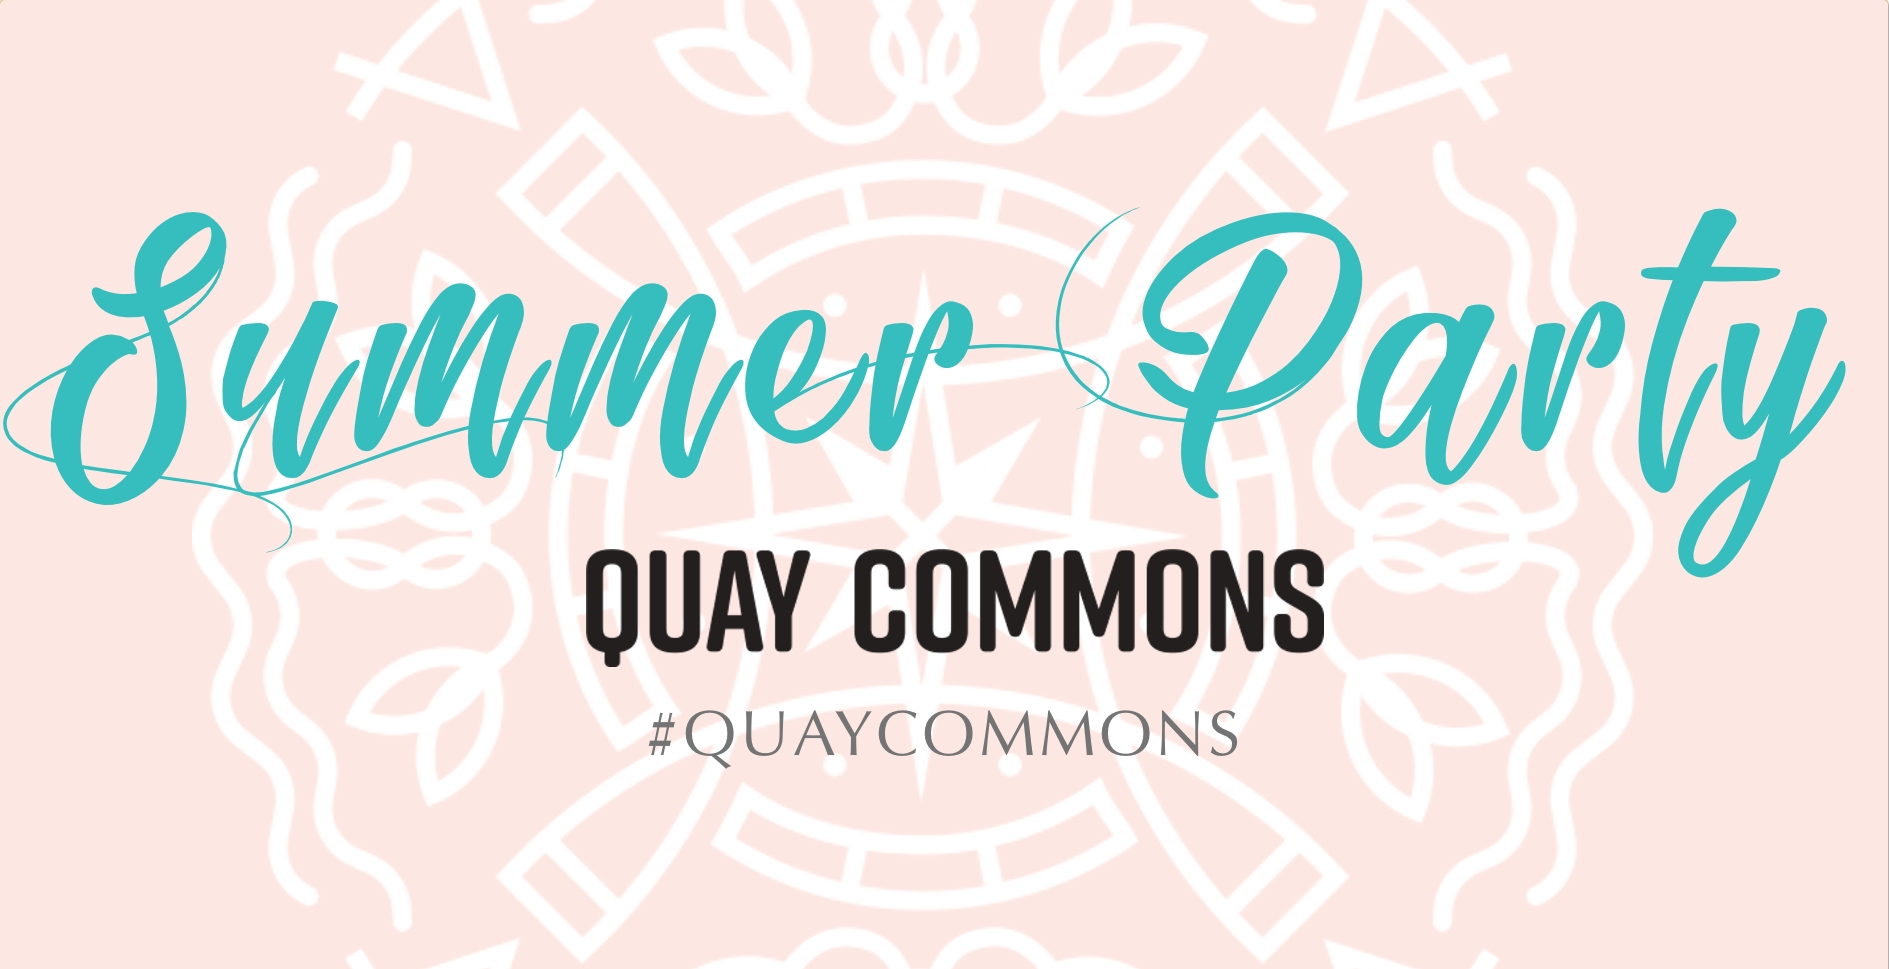 Quay Commons Summer Party Facebook Event JPG.jpg